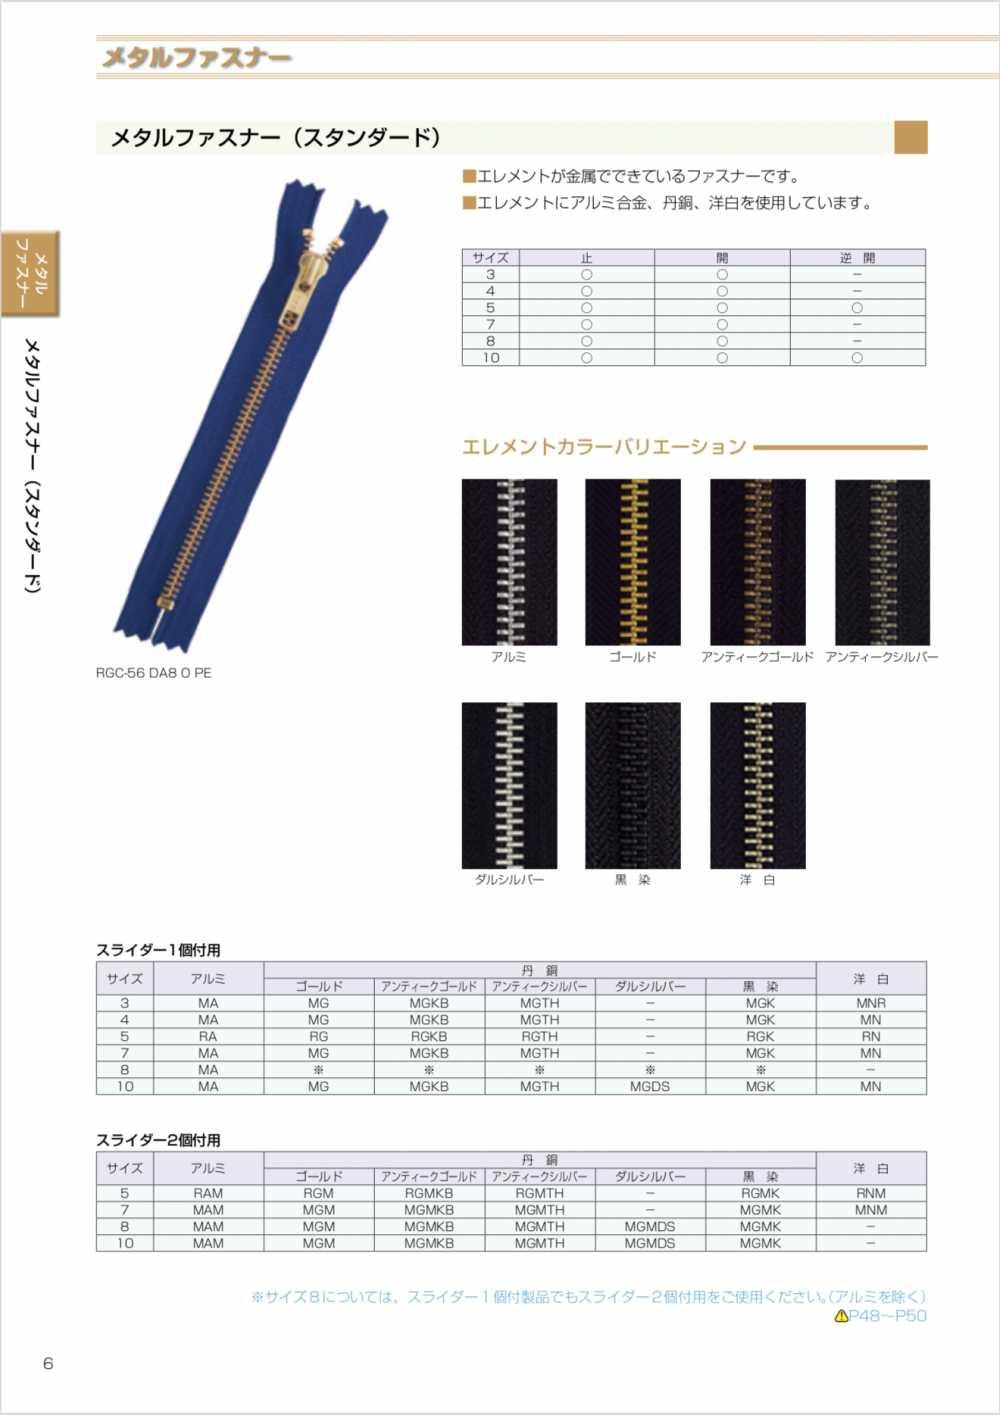 10MGTHC YKKメタルファスナー 10サイズ アンティークシルバー 止め YKK/オークラ商事 - ApparelX アパレル資材卸通販